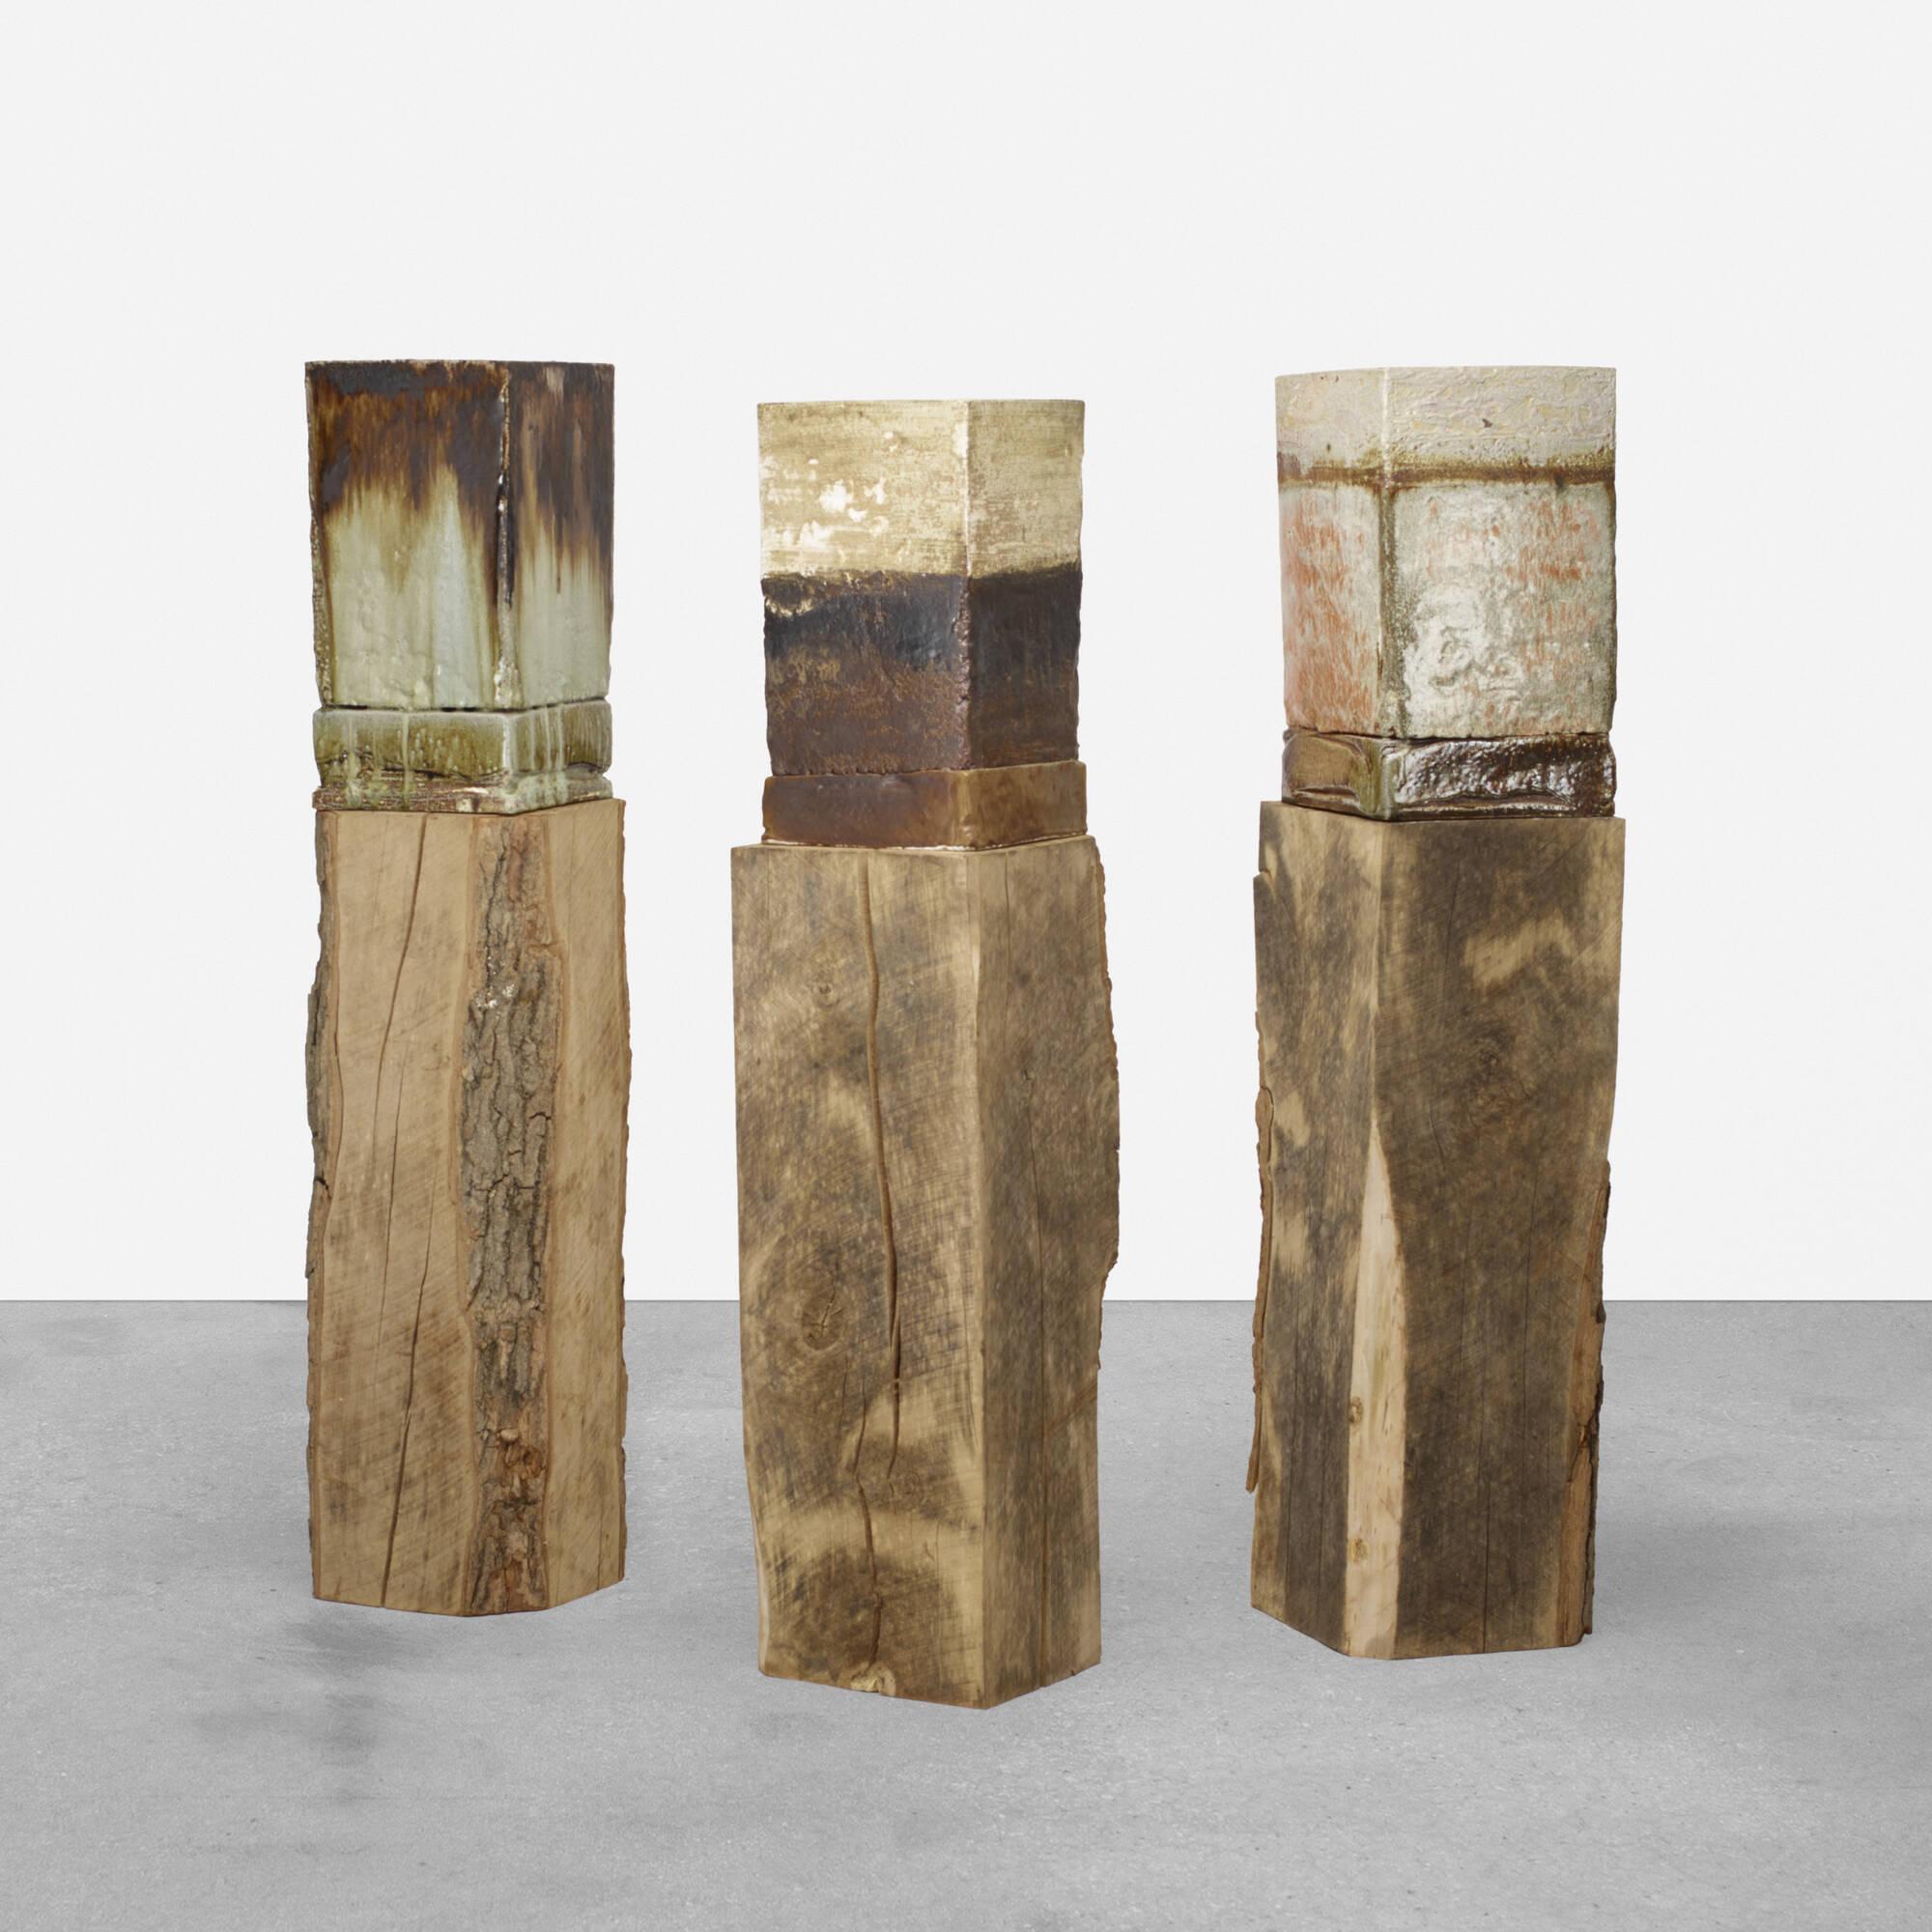 247: Tetsuya Yamada / Untitled (three works) (1 of 3)